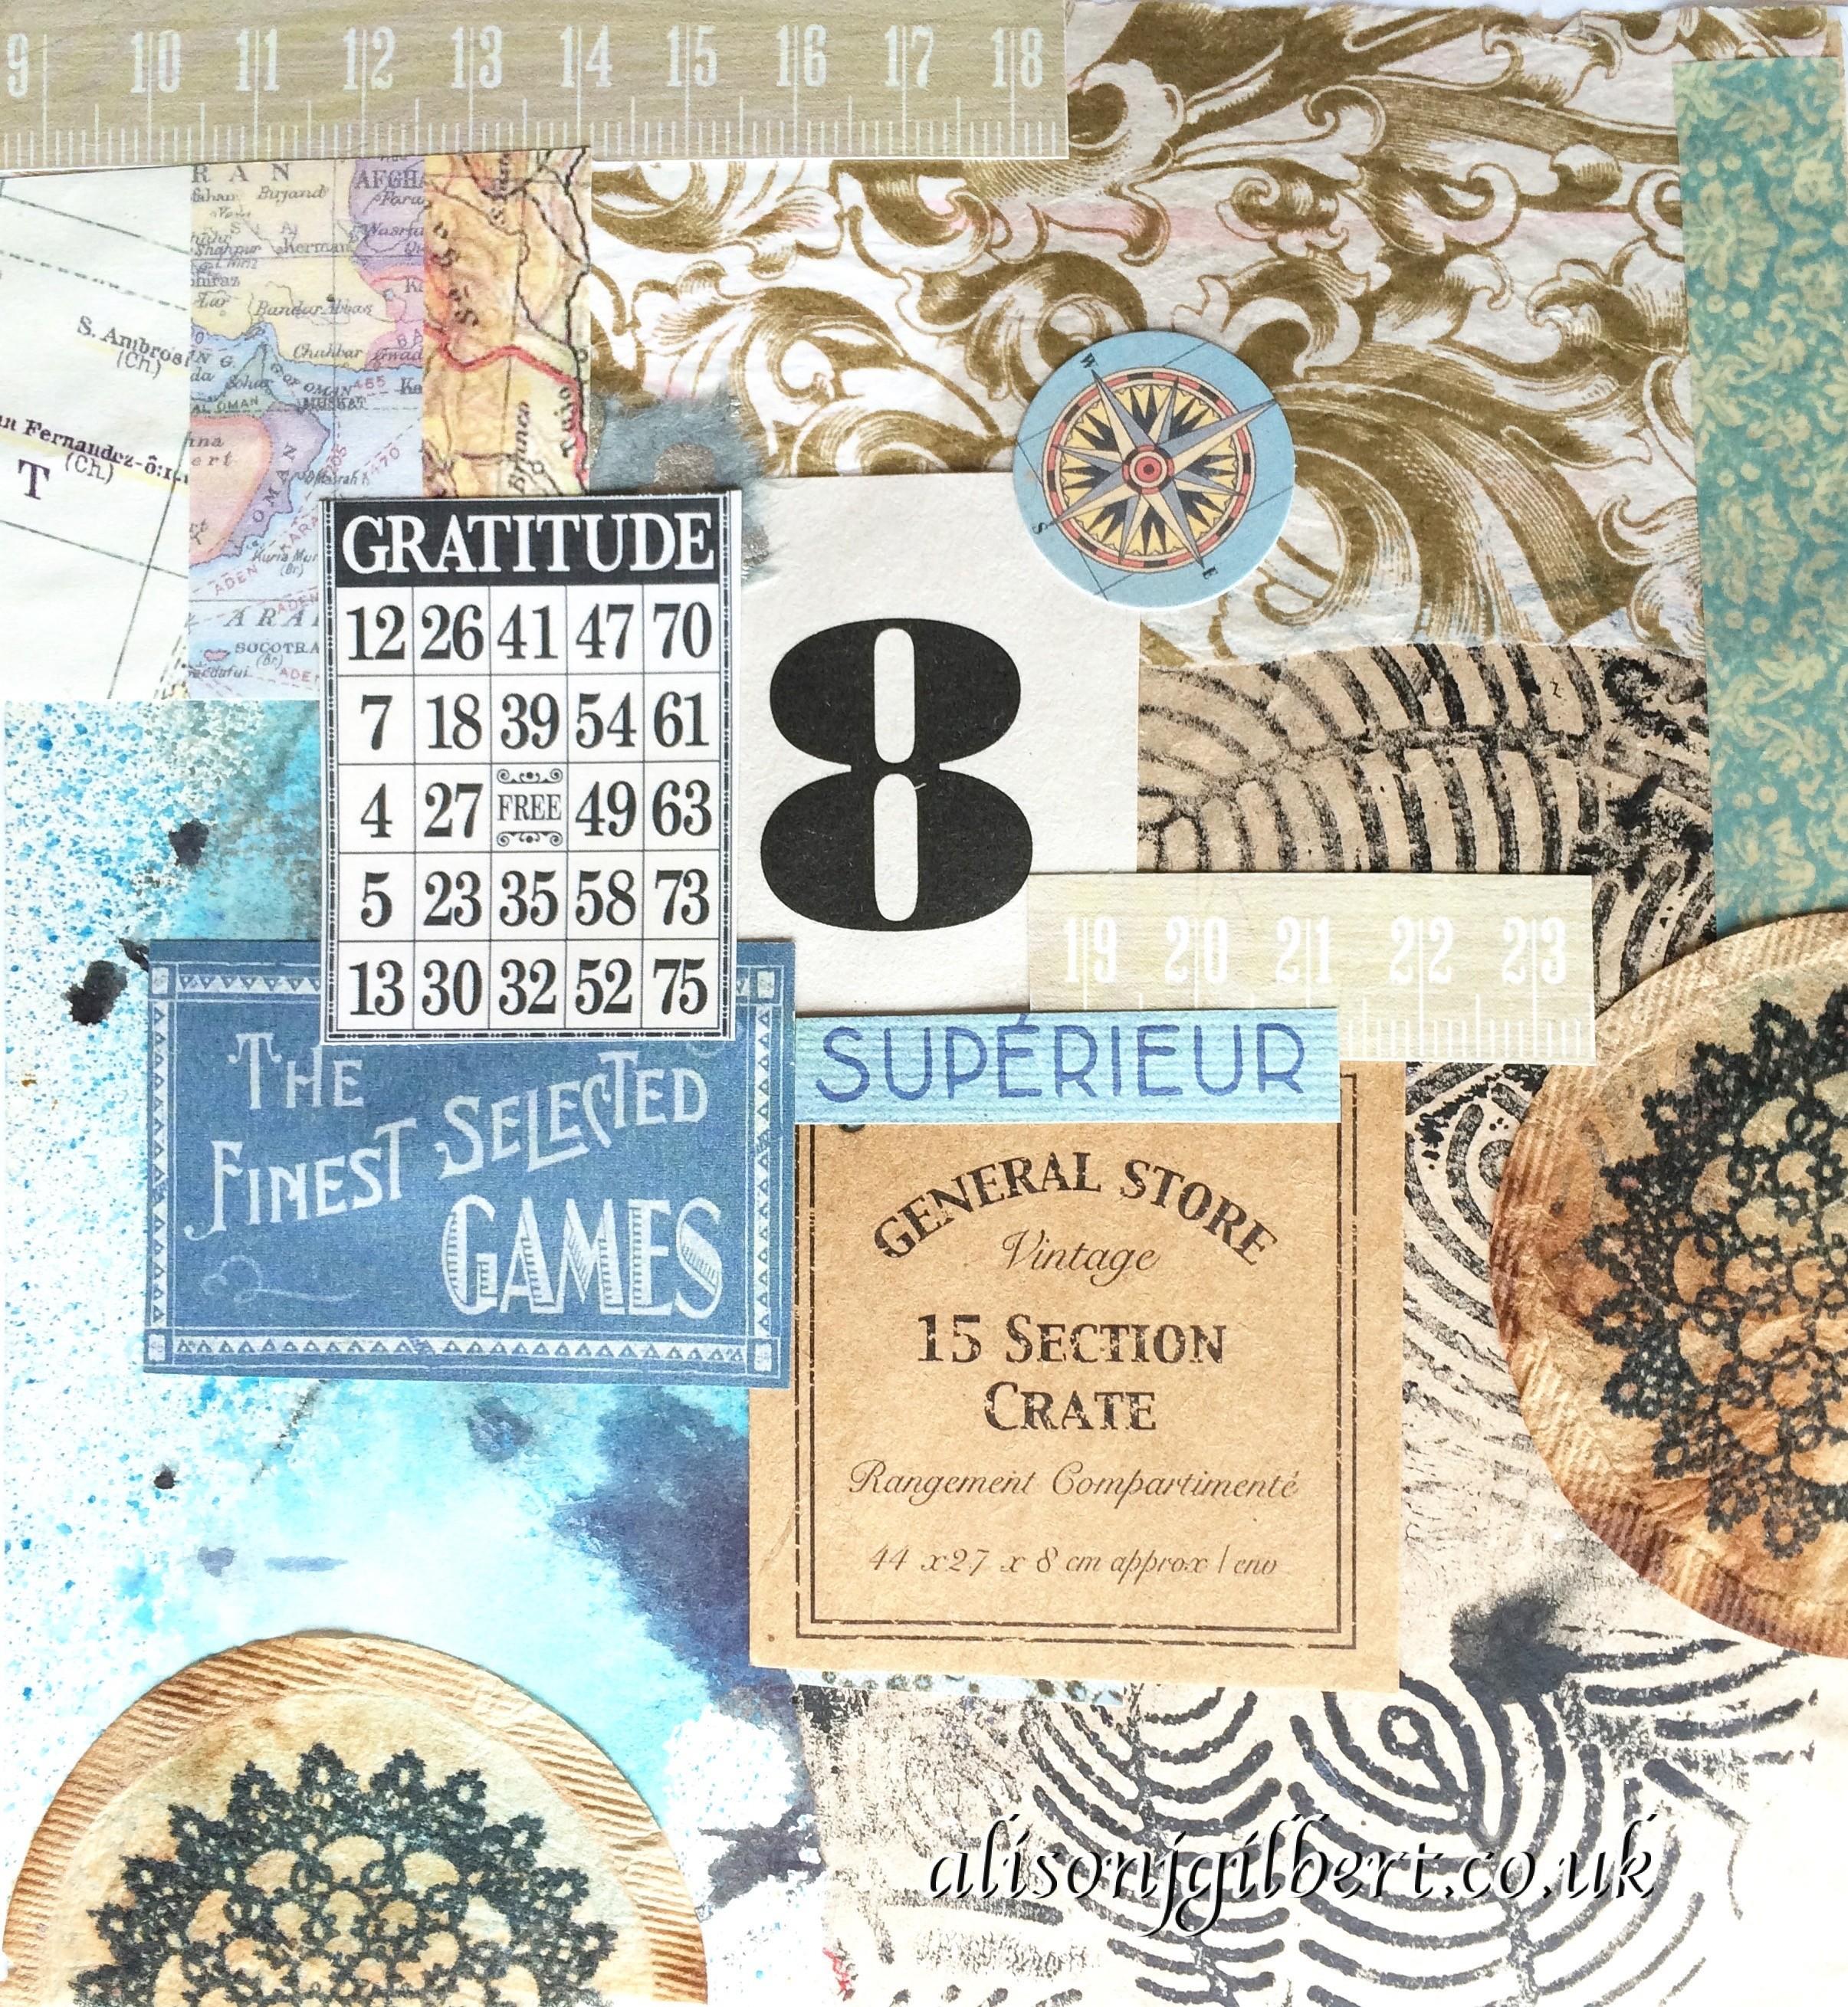 Grateful eight